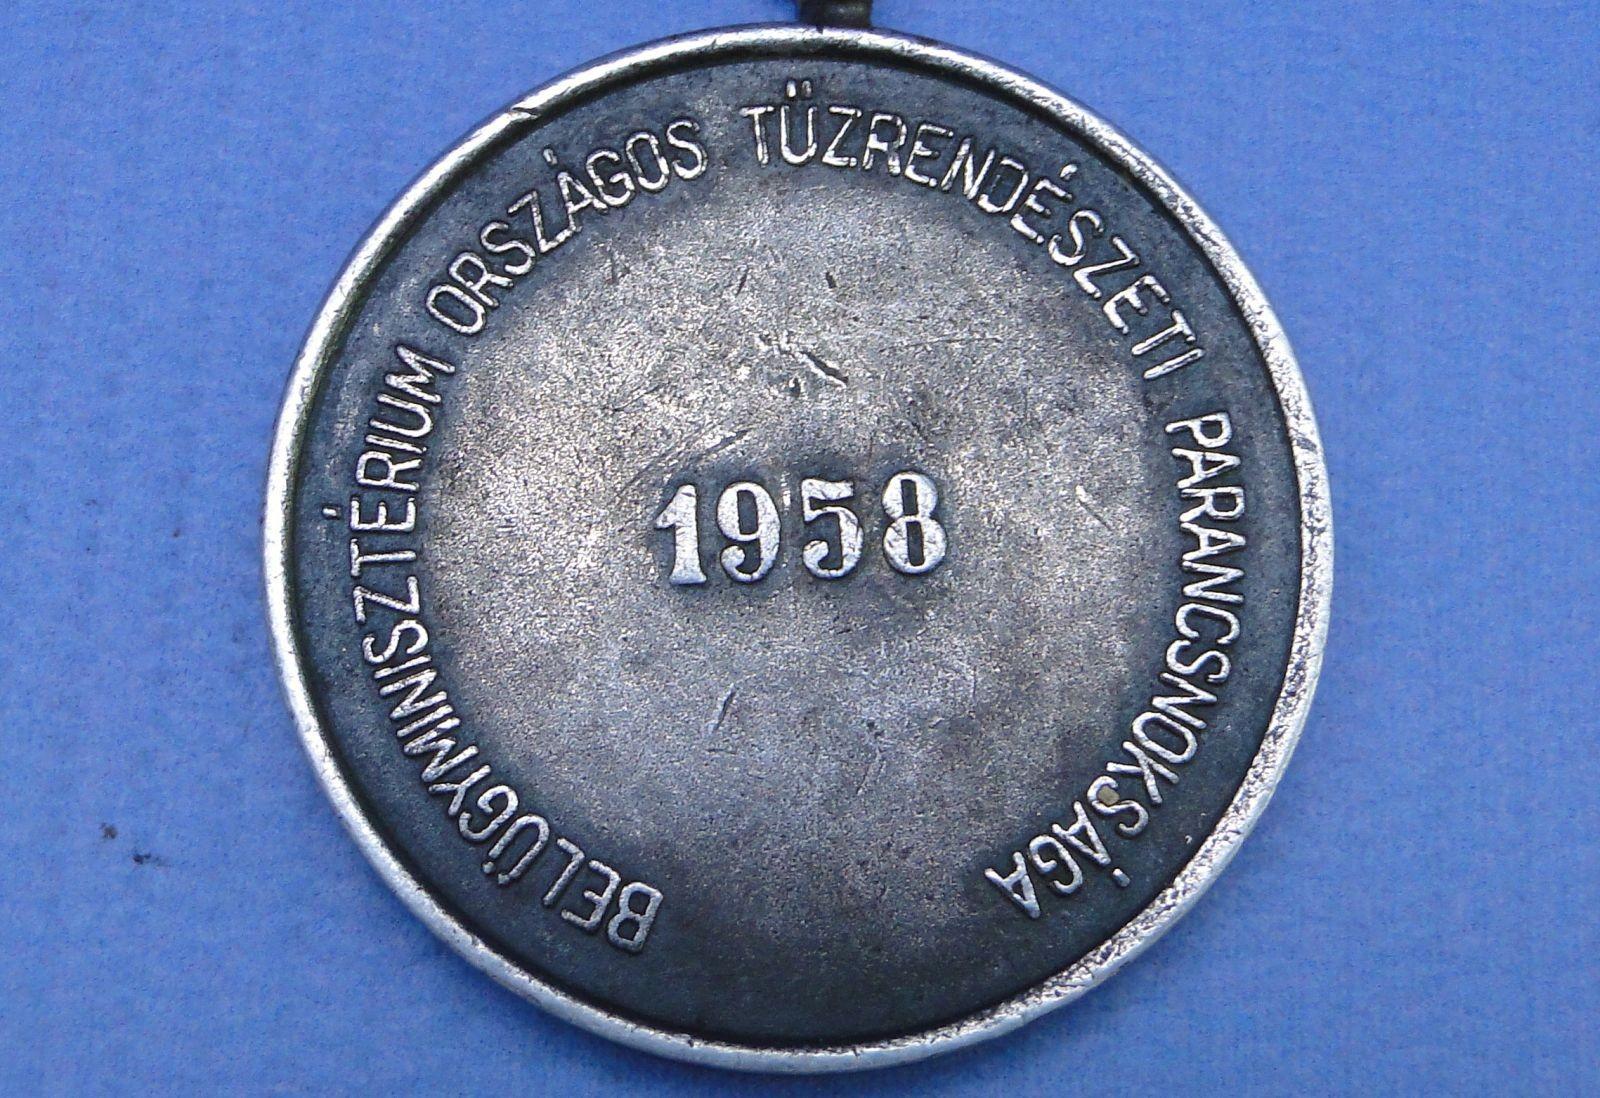 DSC09258.JPG (1600×1098)